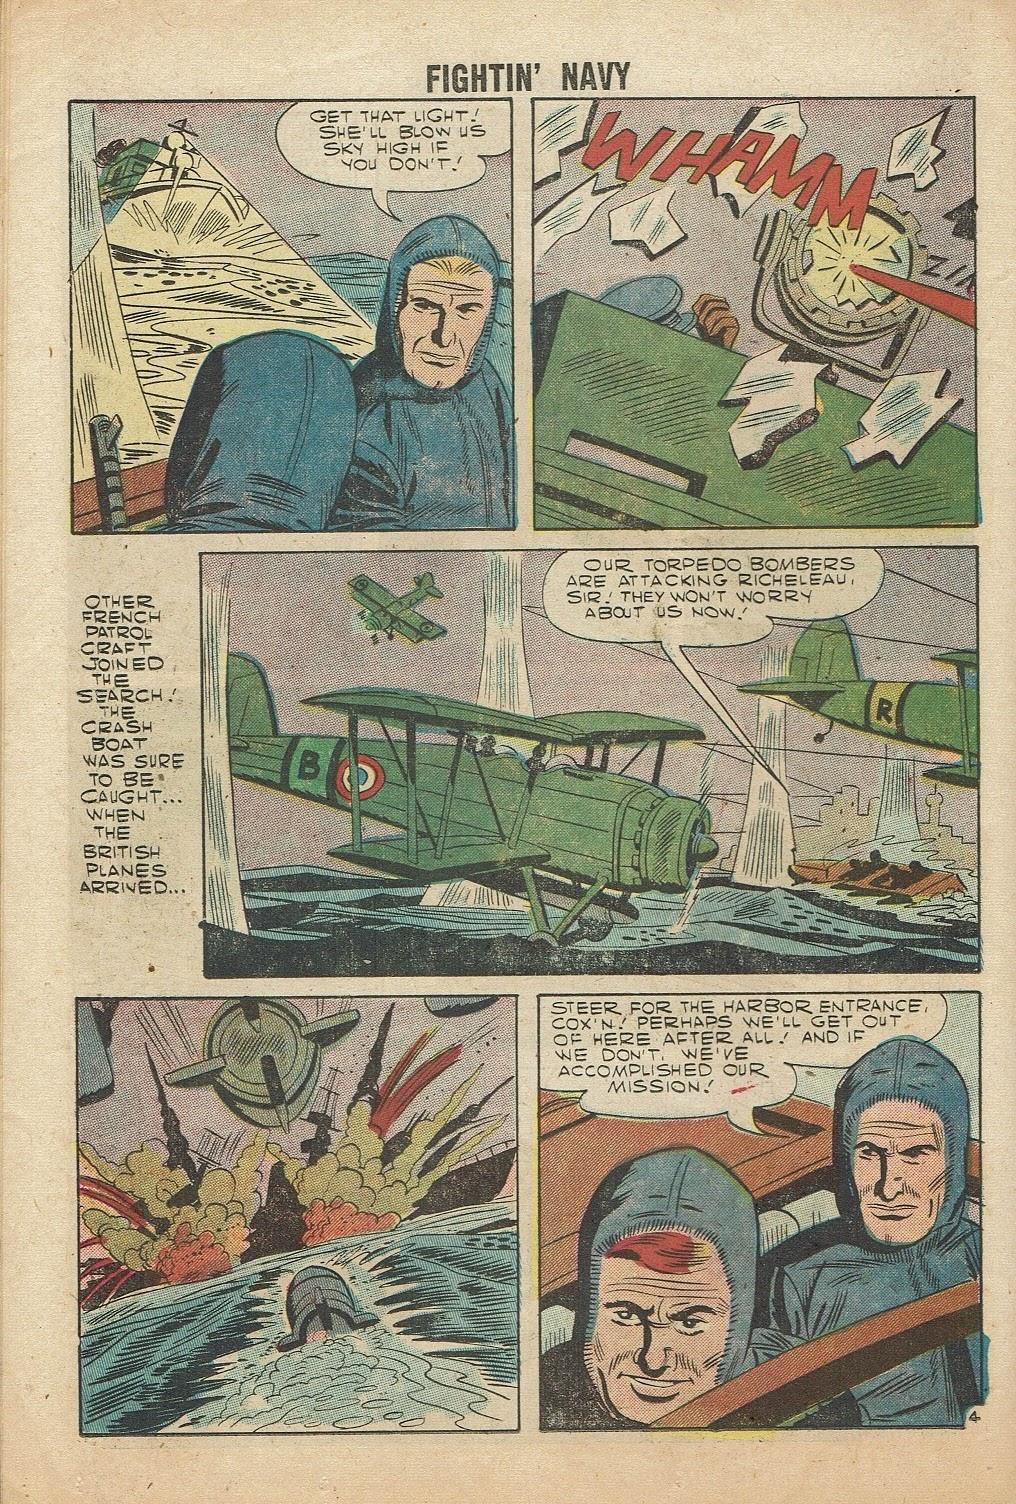 Read online Fightin' Navy comic -  Issue #81 - 26